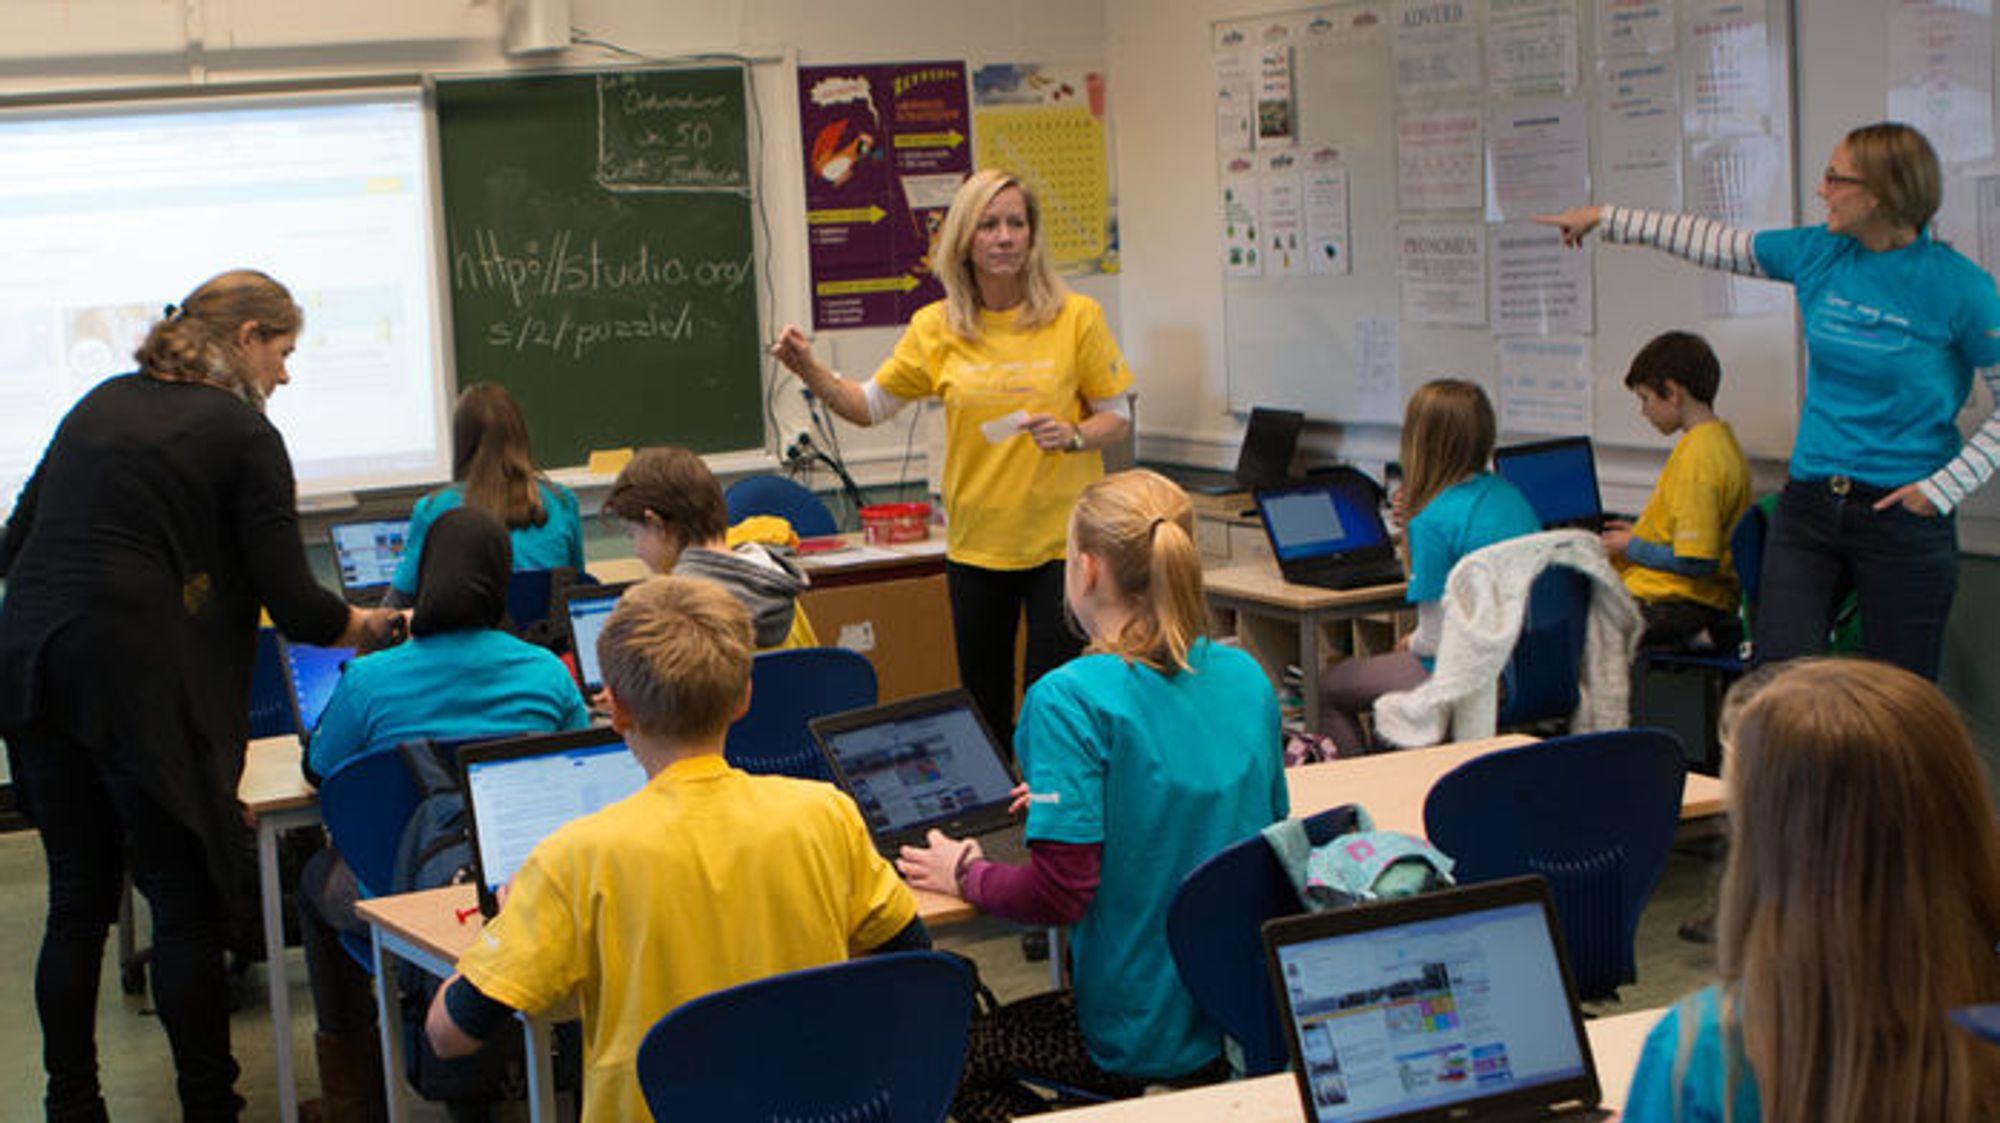 Den frivillige bevegelsen Lær Kidsa Koding arrangerte Kodetimen med 20.000 deltagere i 2014, en dobling fra ifjor.